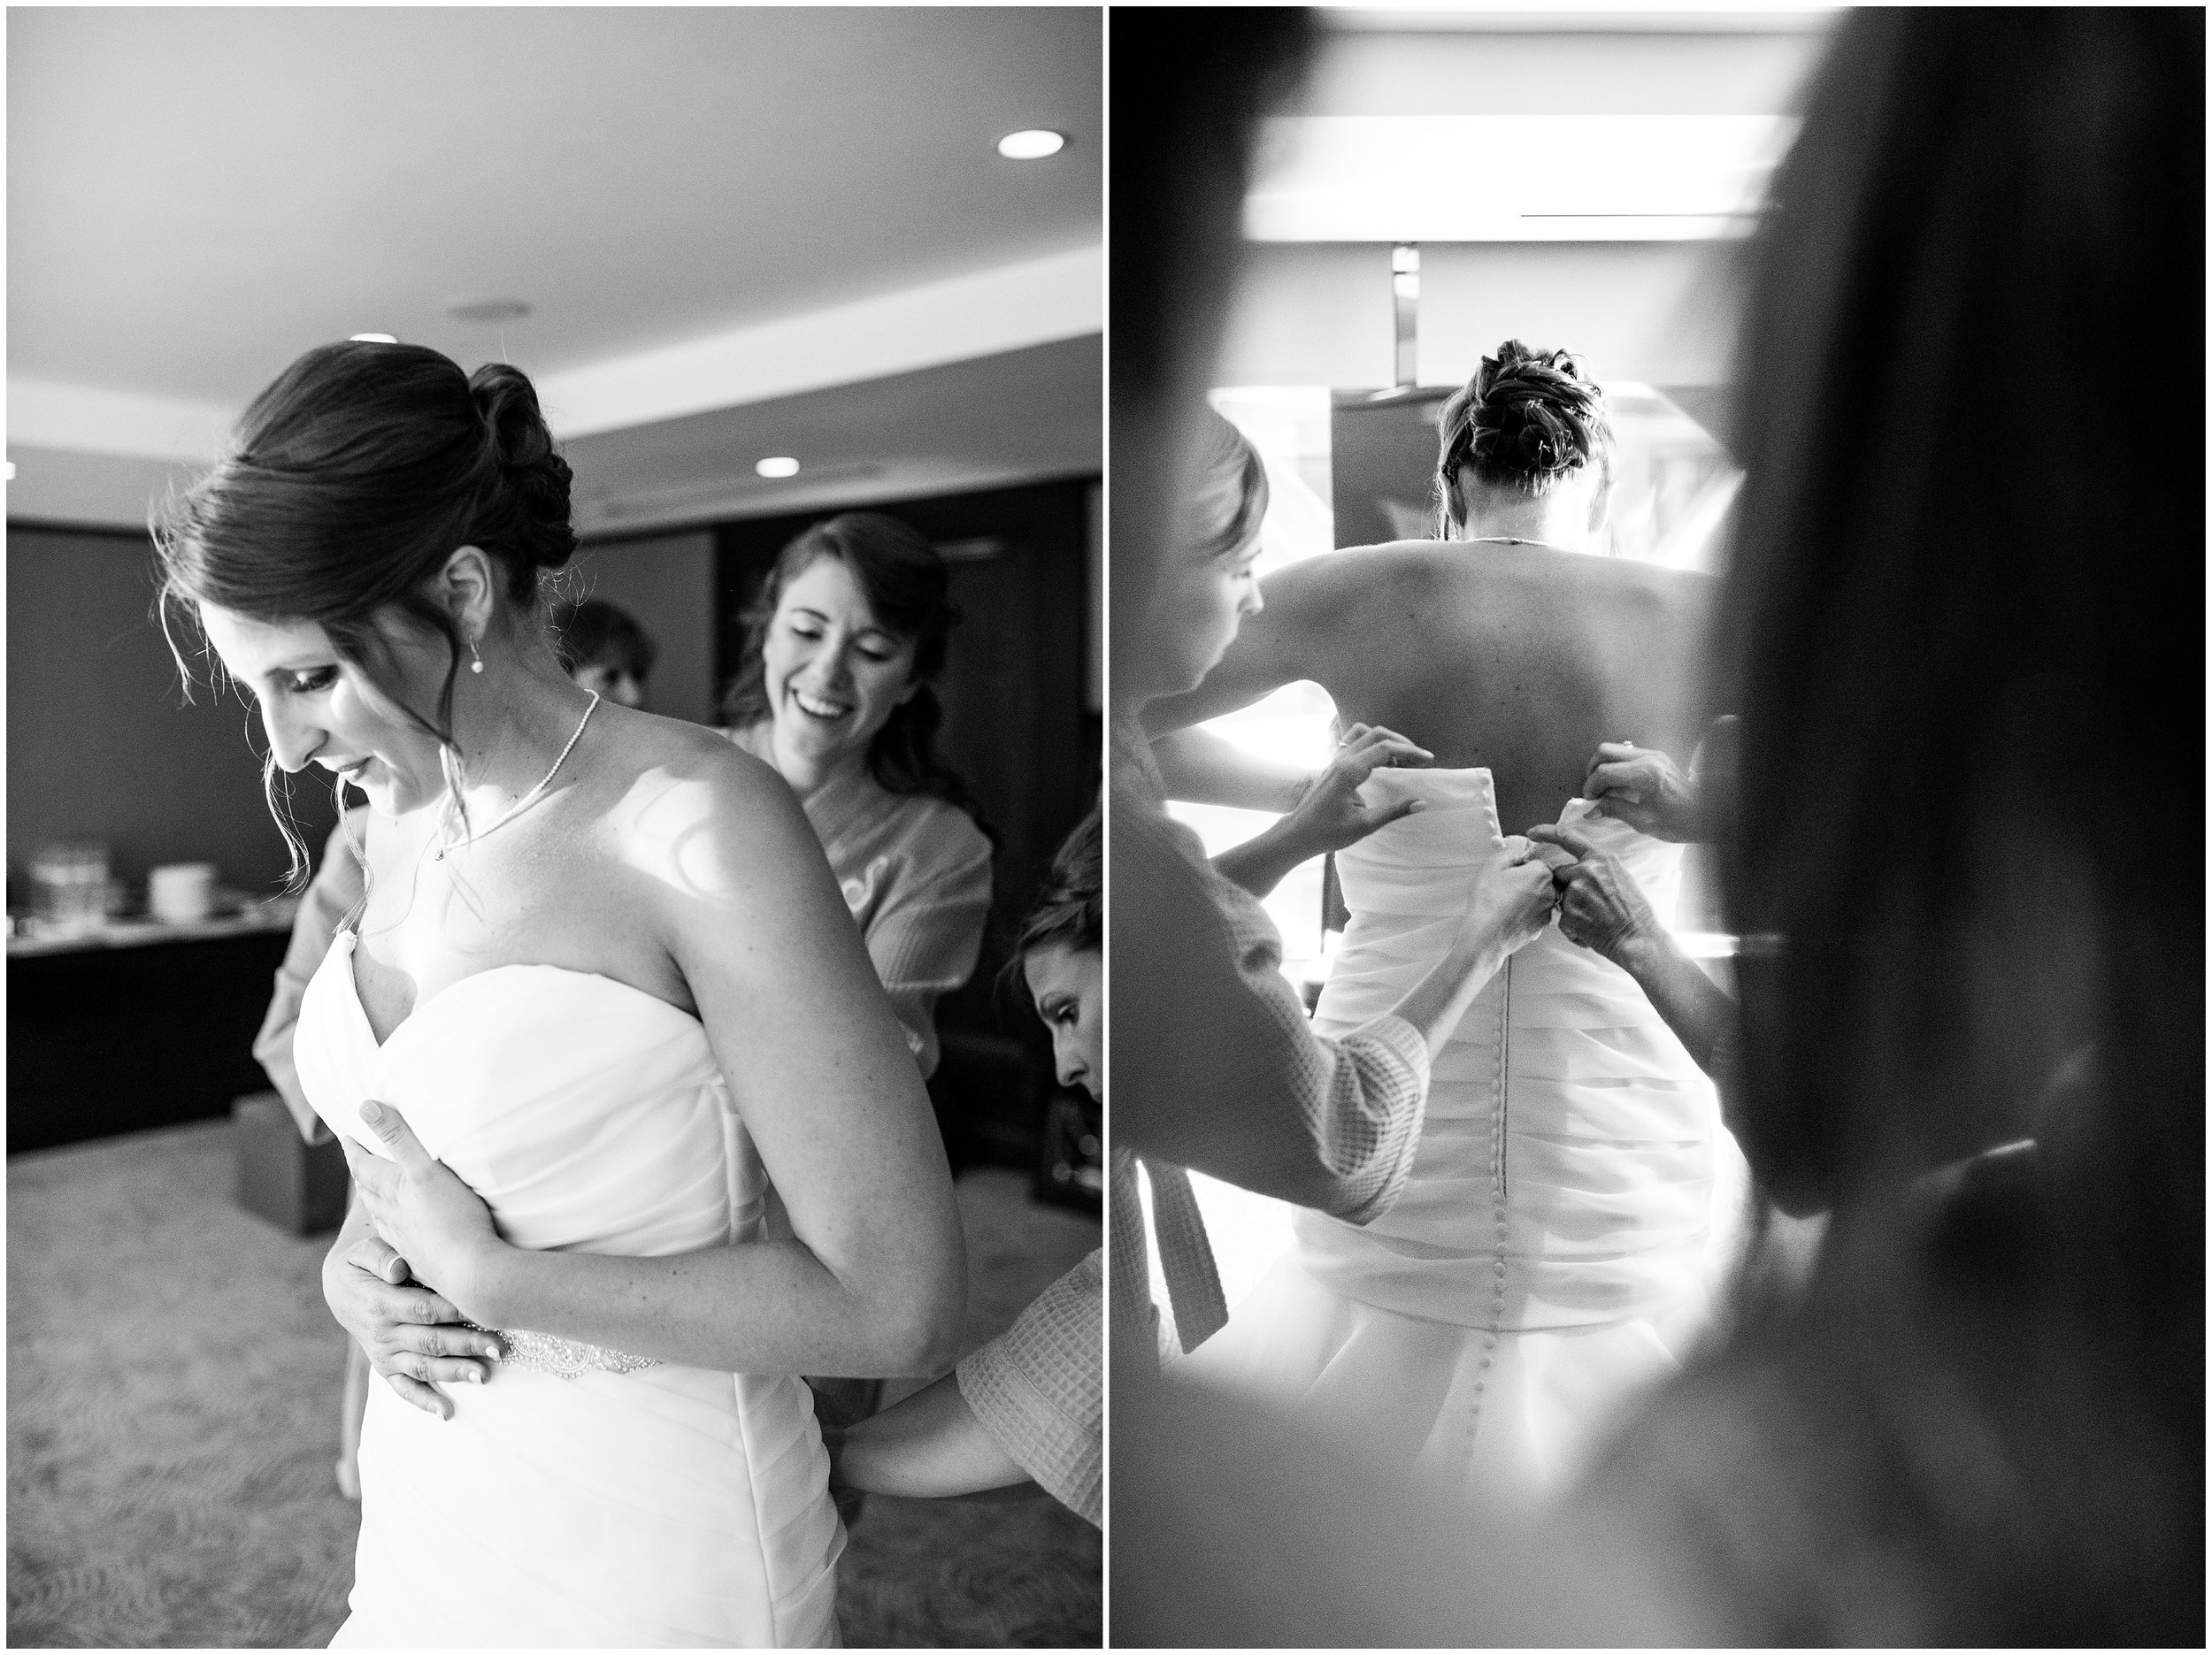 Boston Wedding Photographer, Iryna's Photography. The Bostonian Boston Hotel Wedding Photos,Ceremony at St Cecilia Parish,Wedding Photos, Boston Weddings.